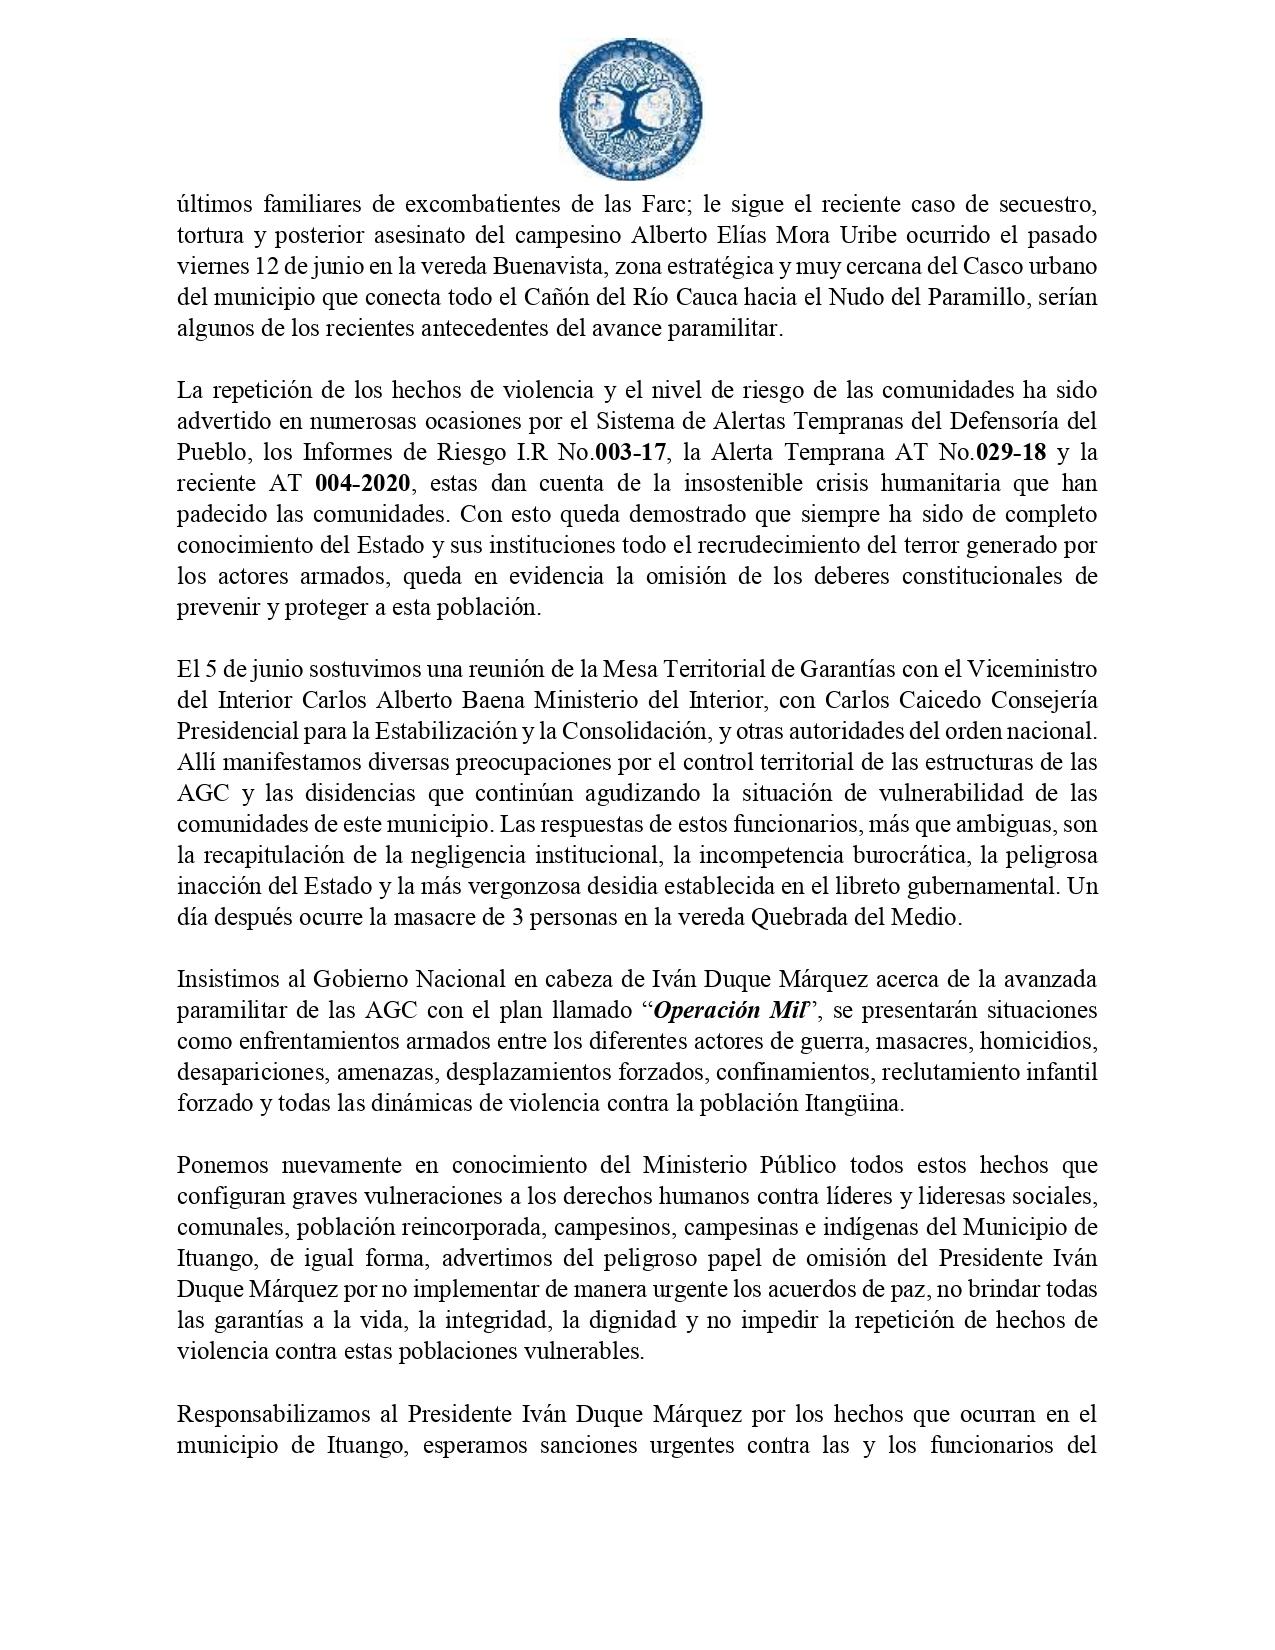 Denuncia de Riesgo Consumado para el municipio de Ituango-Final_page-0002